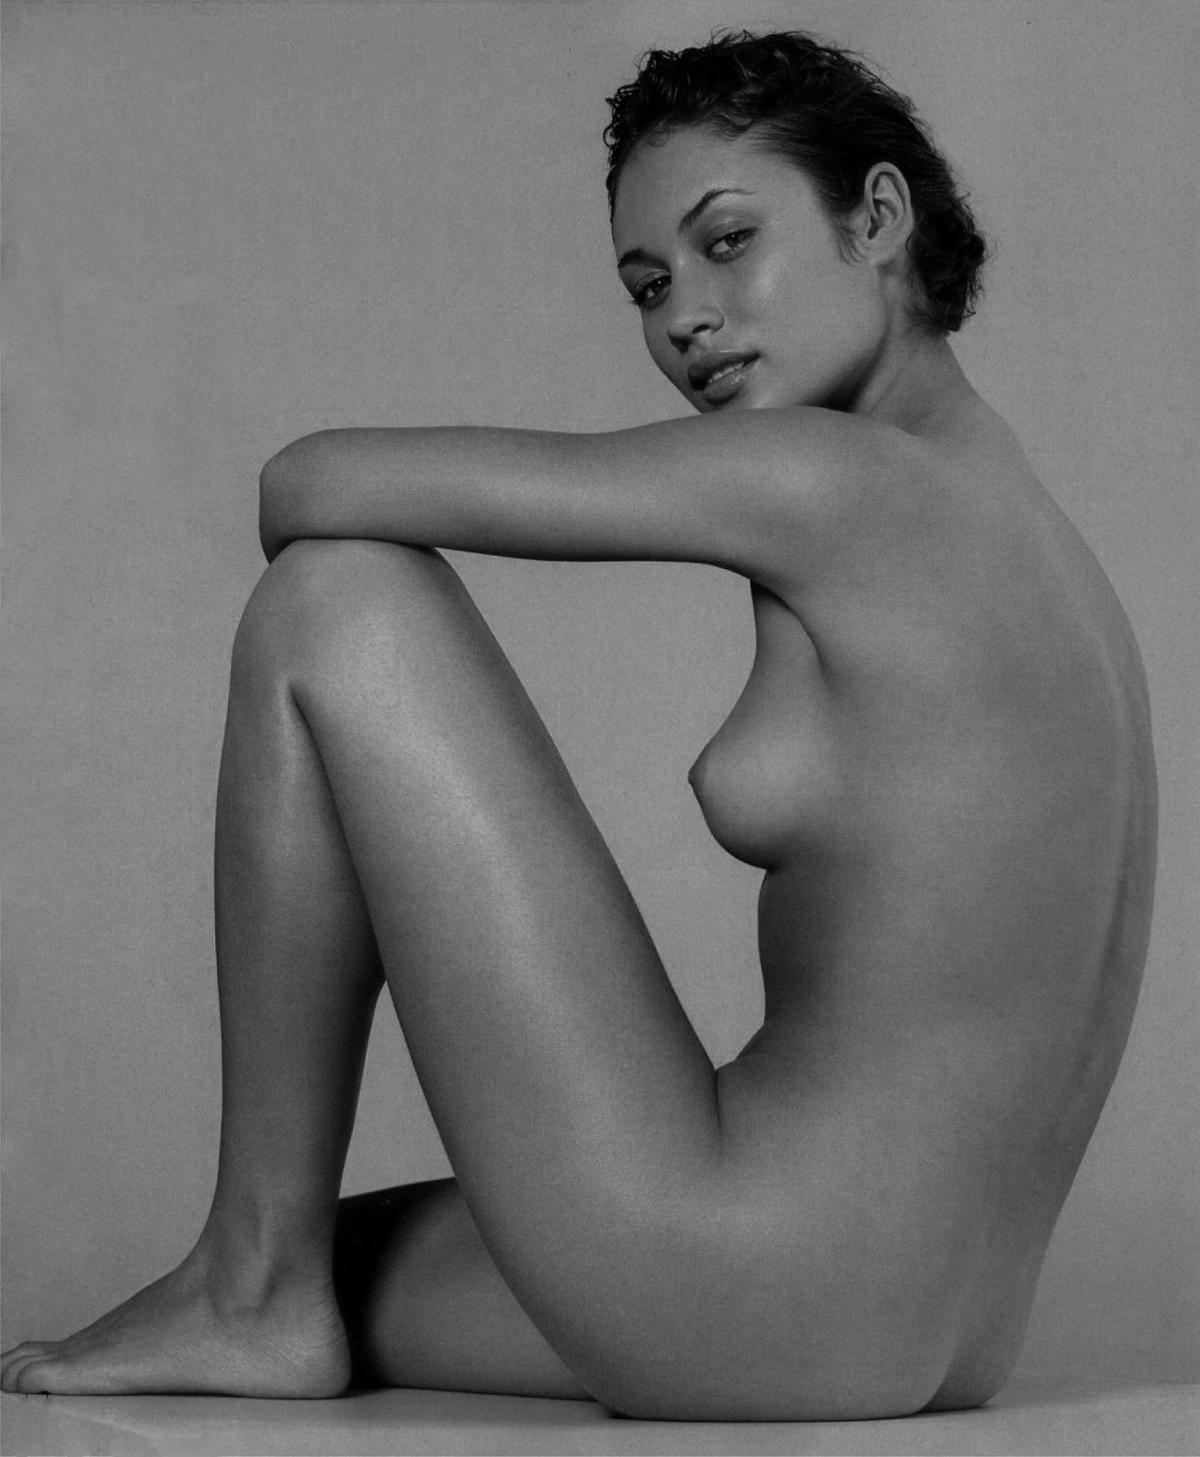 Olga kurylenko naked pictures